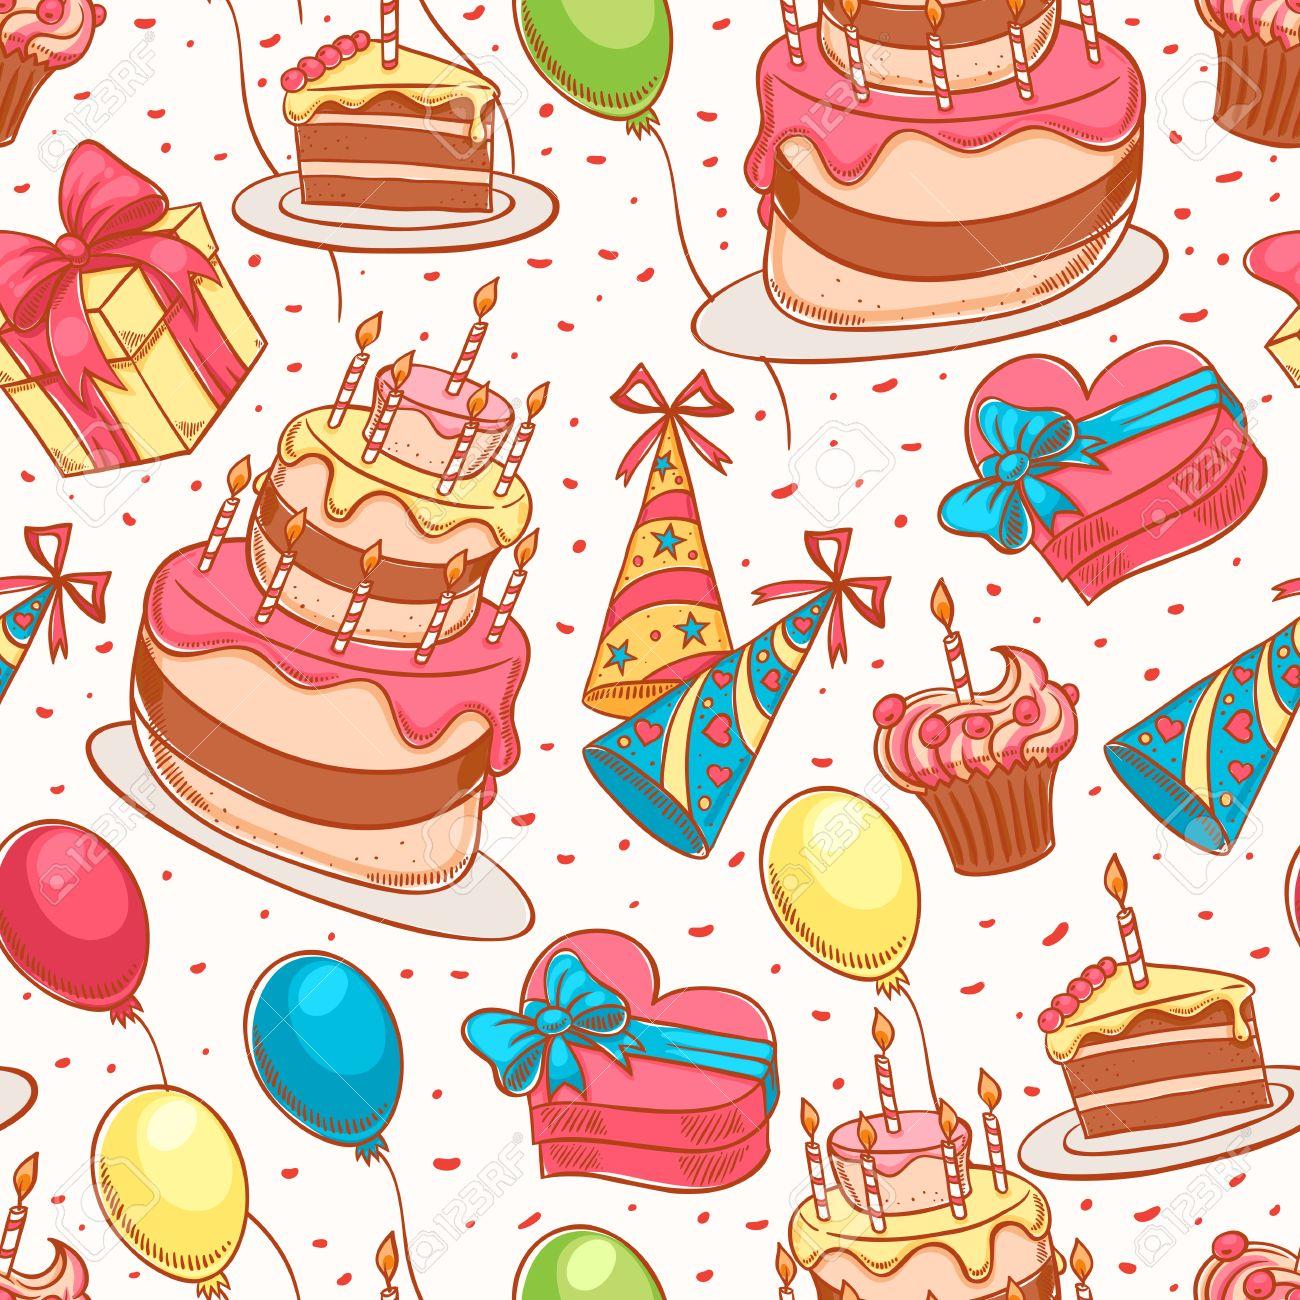 Happy Birthday Cute Seamless Background With A Birthday Cake